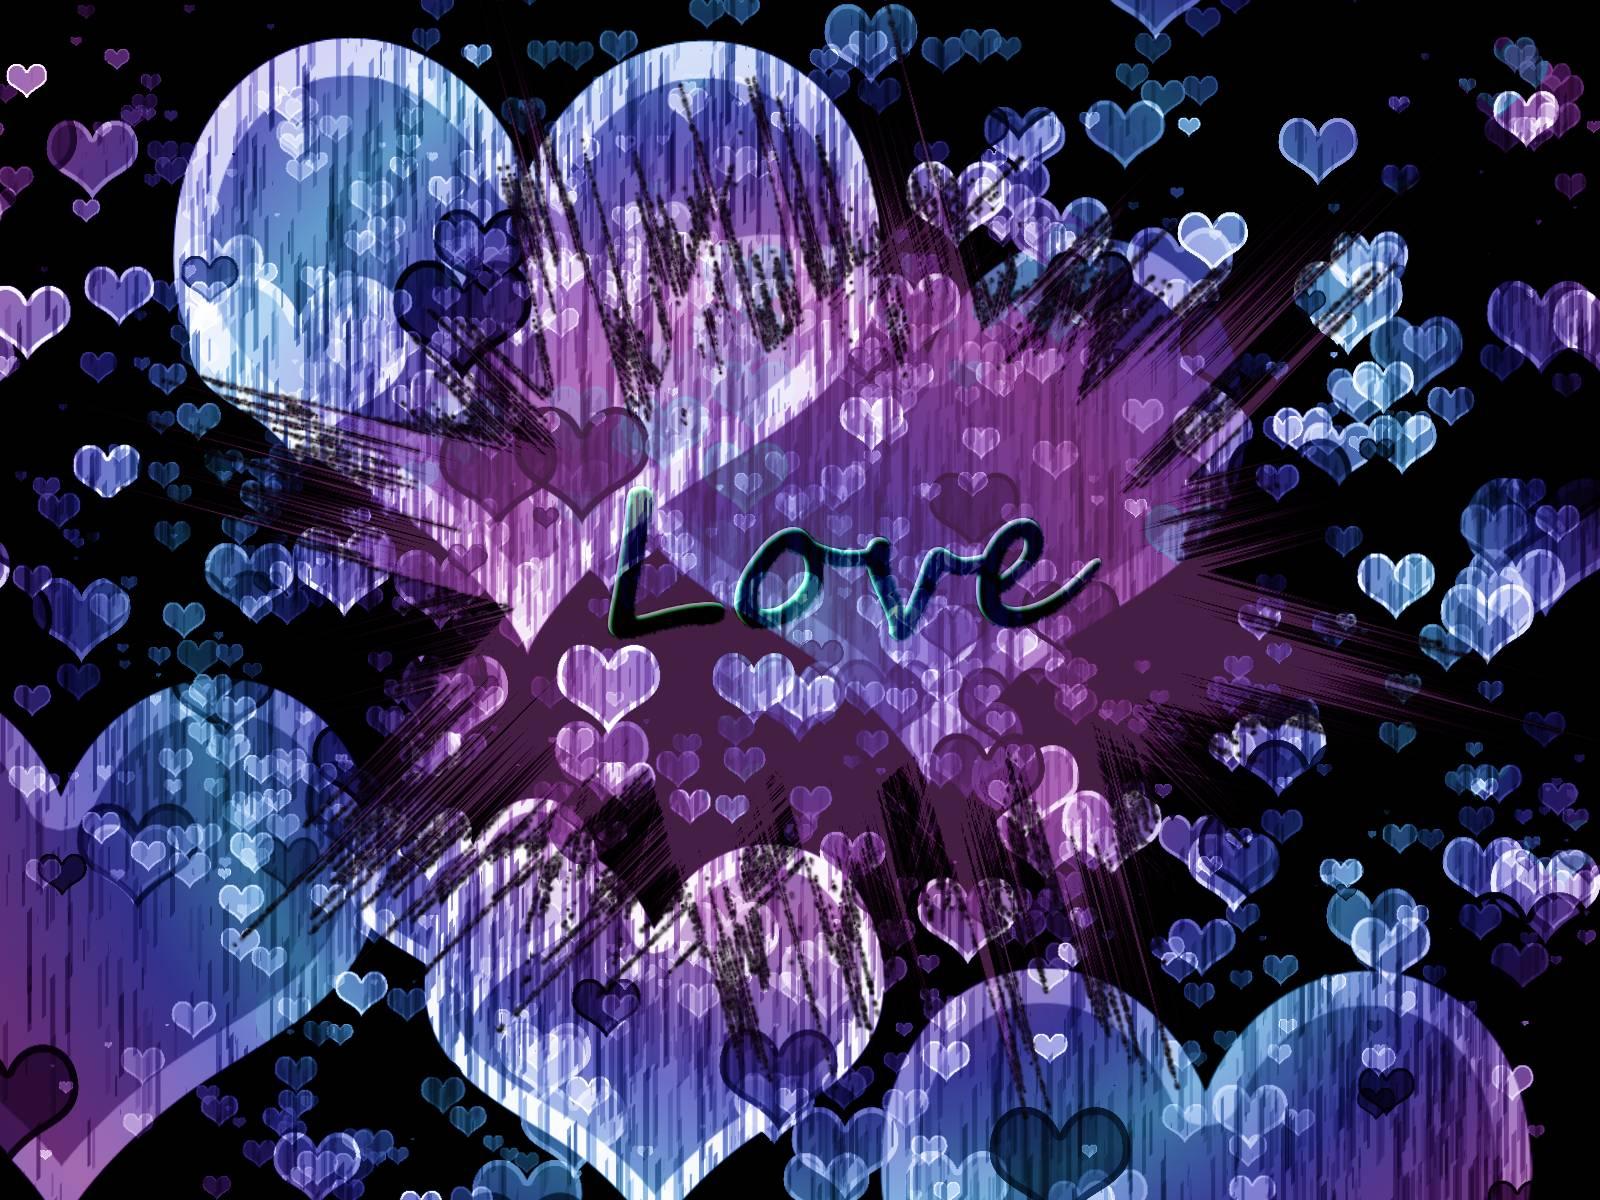 Purple And Black Hearts Wallpaper: Purple Love Wallpapers